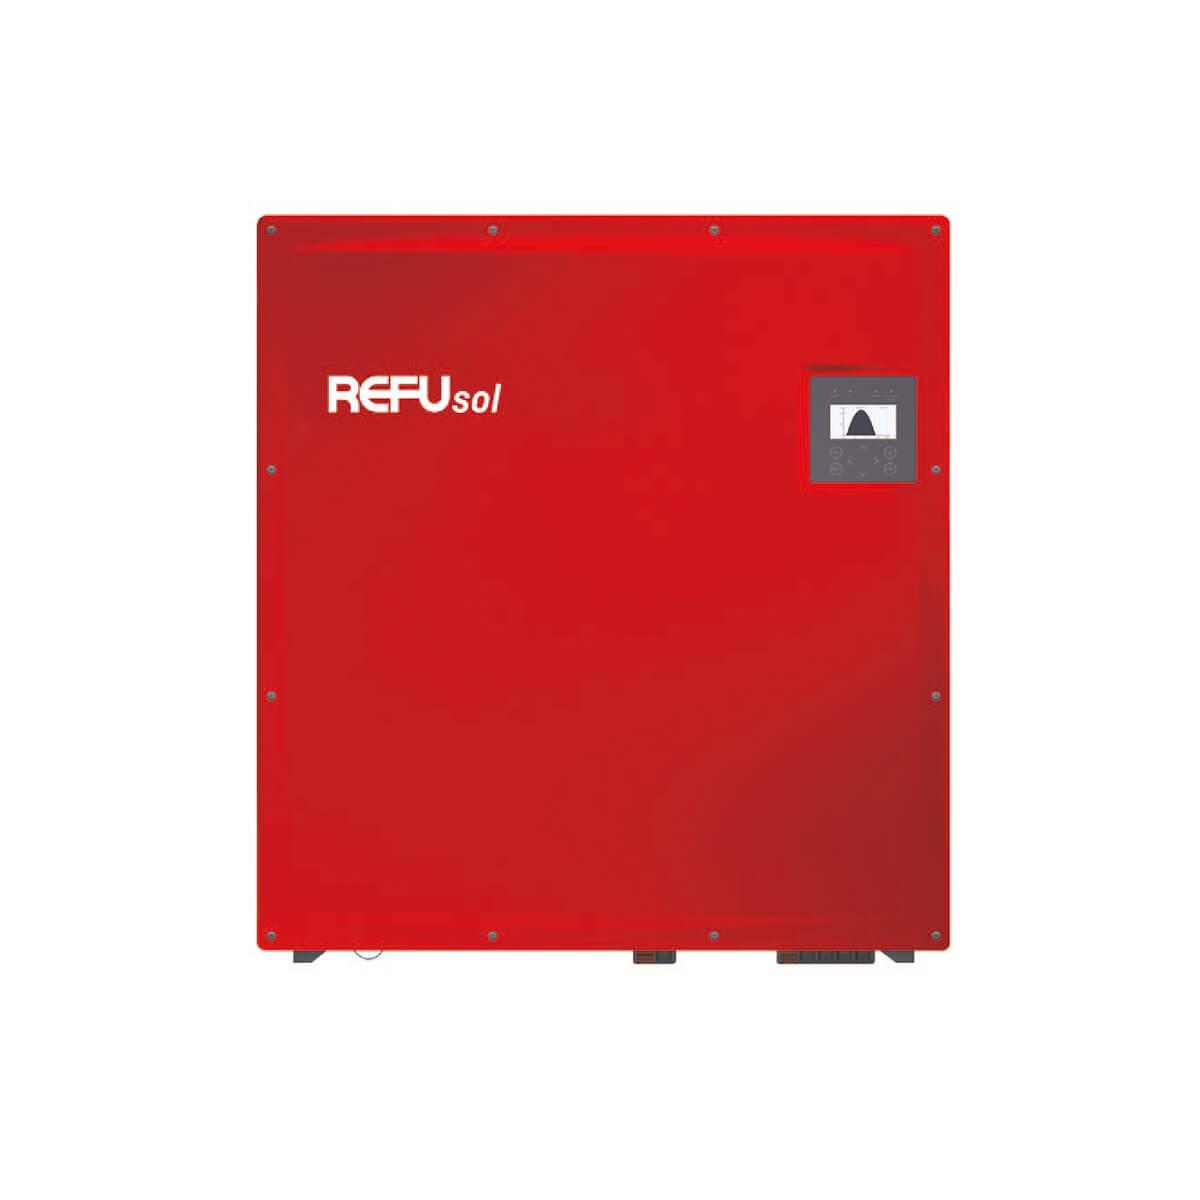 refusol 46kW inverter, refusol 46k-mv 46kW inverter, refusol 46k-mv inverter, refusol 46k-mv, refusol 46 kW, REFUSOL 46 KW